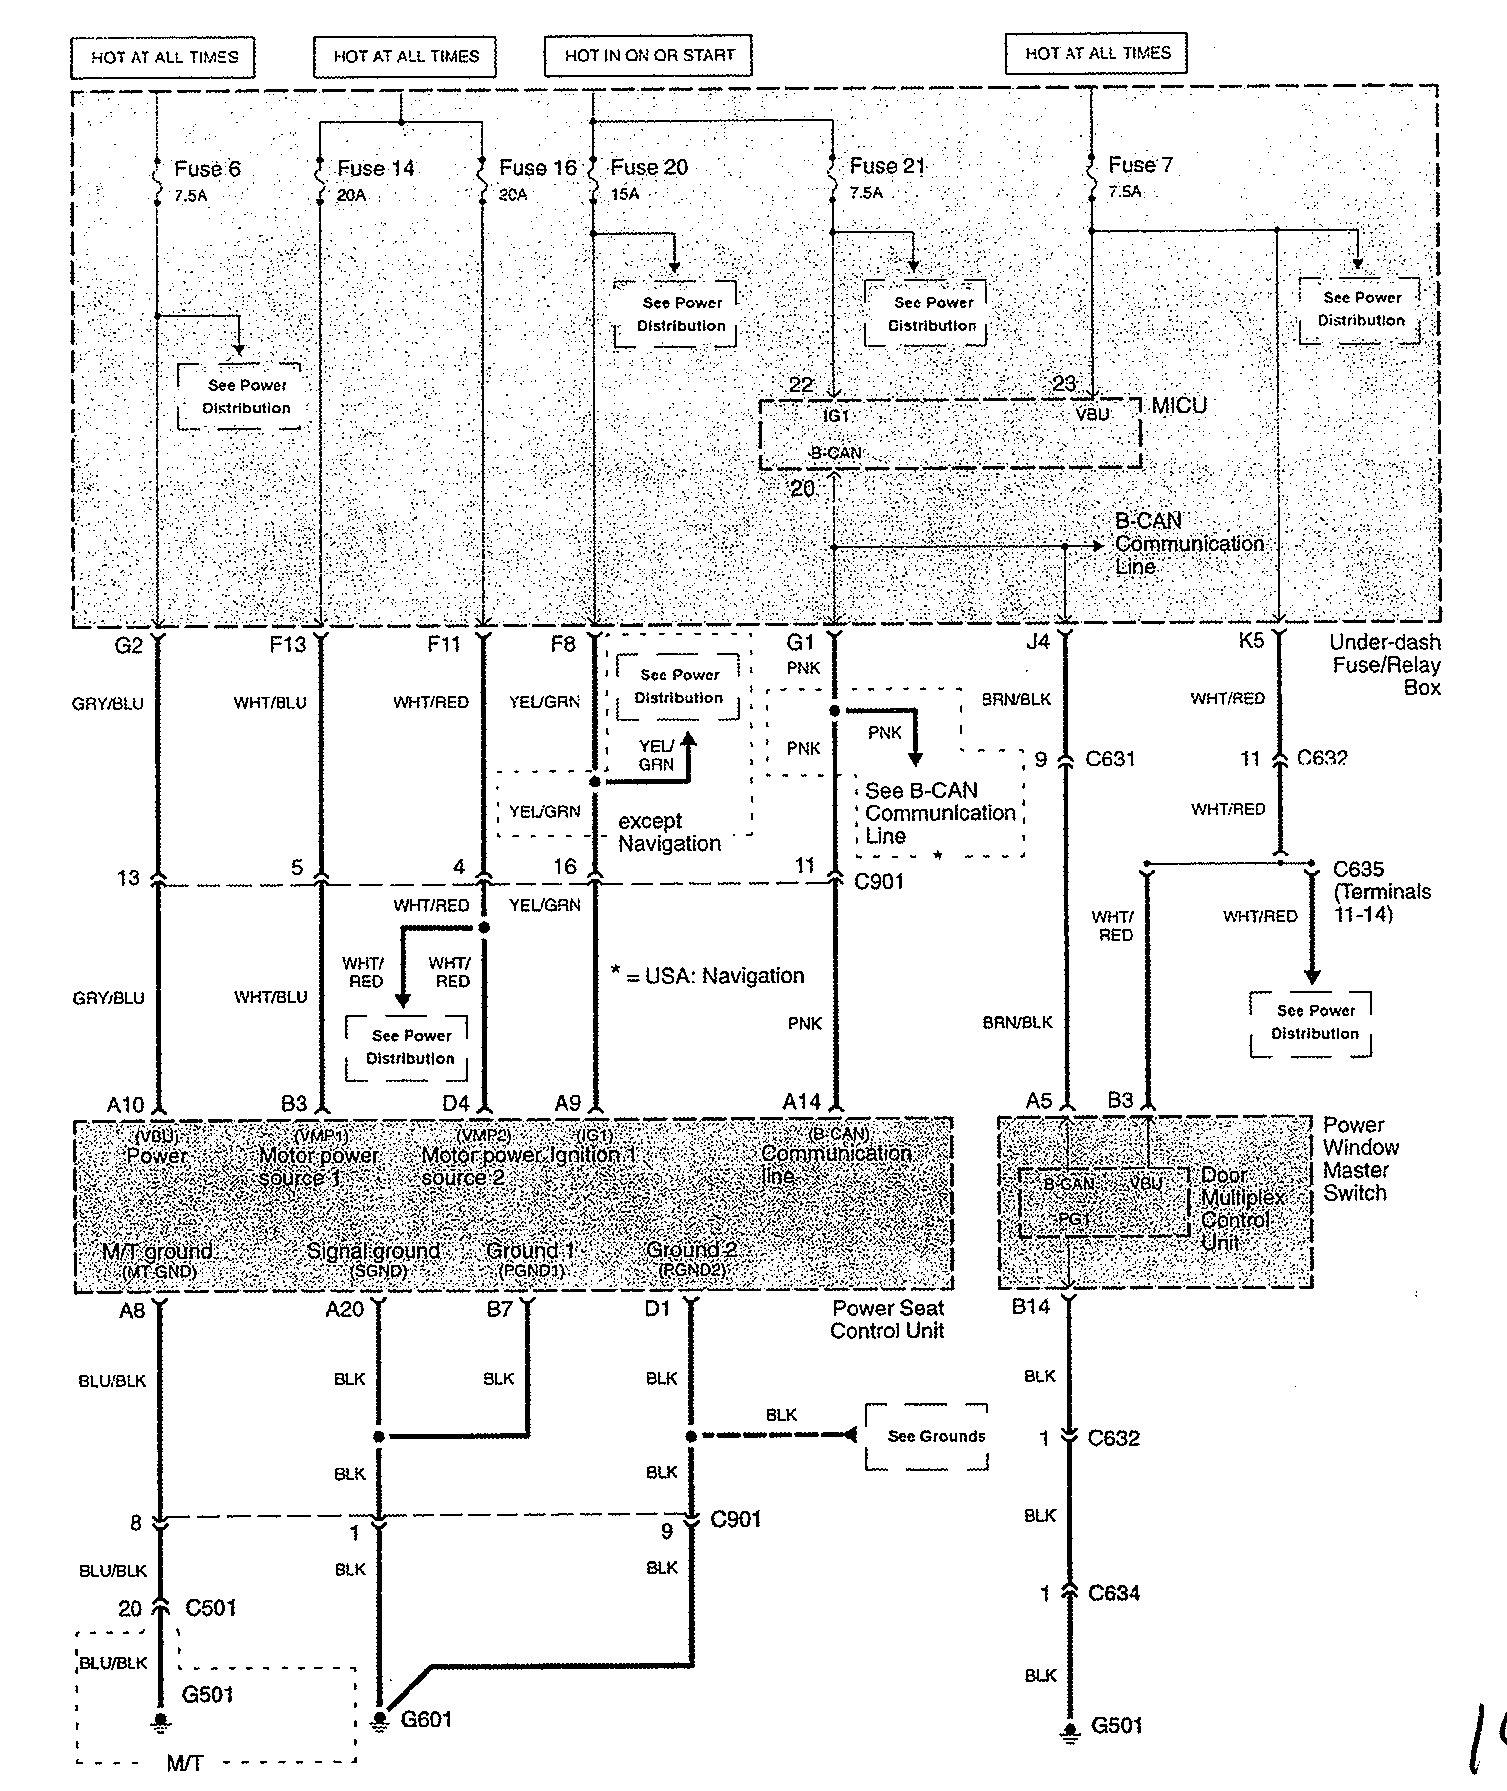 2009 acura tl fuse diagram wiring schematic harness